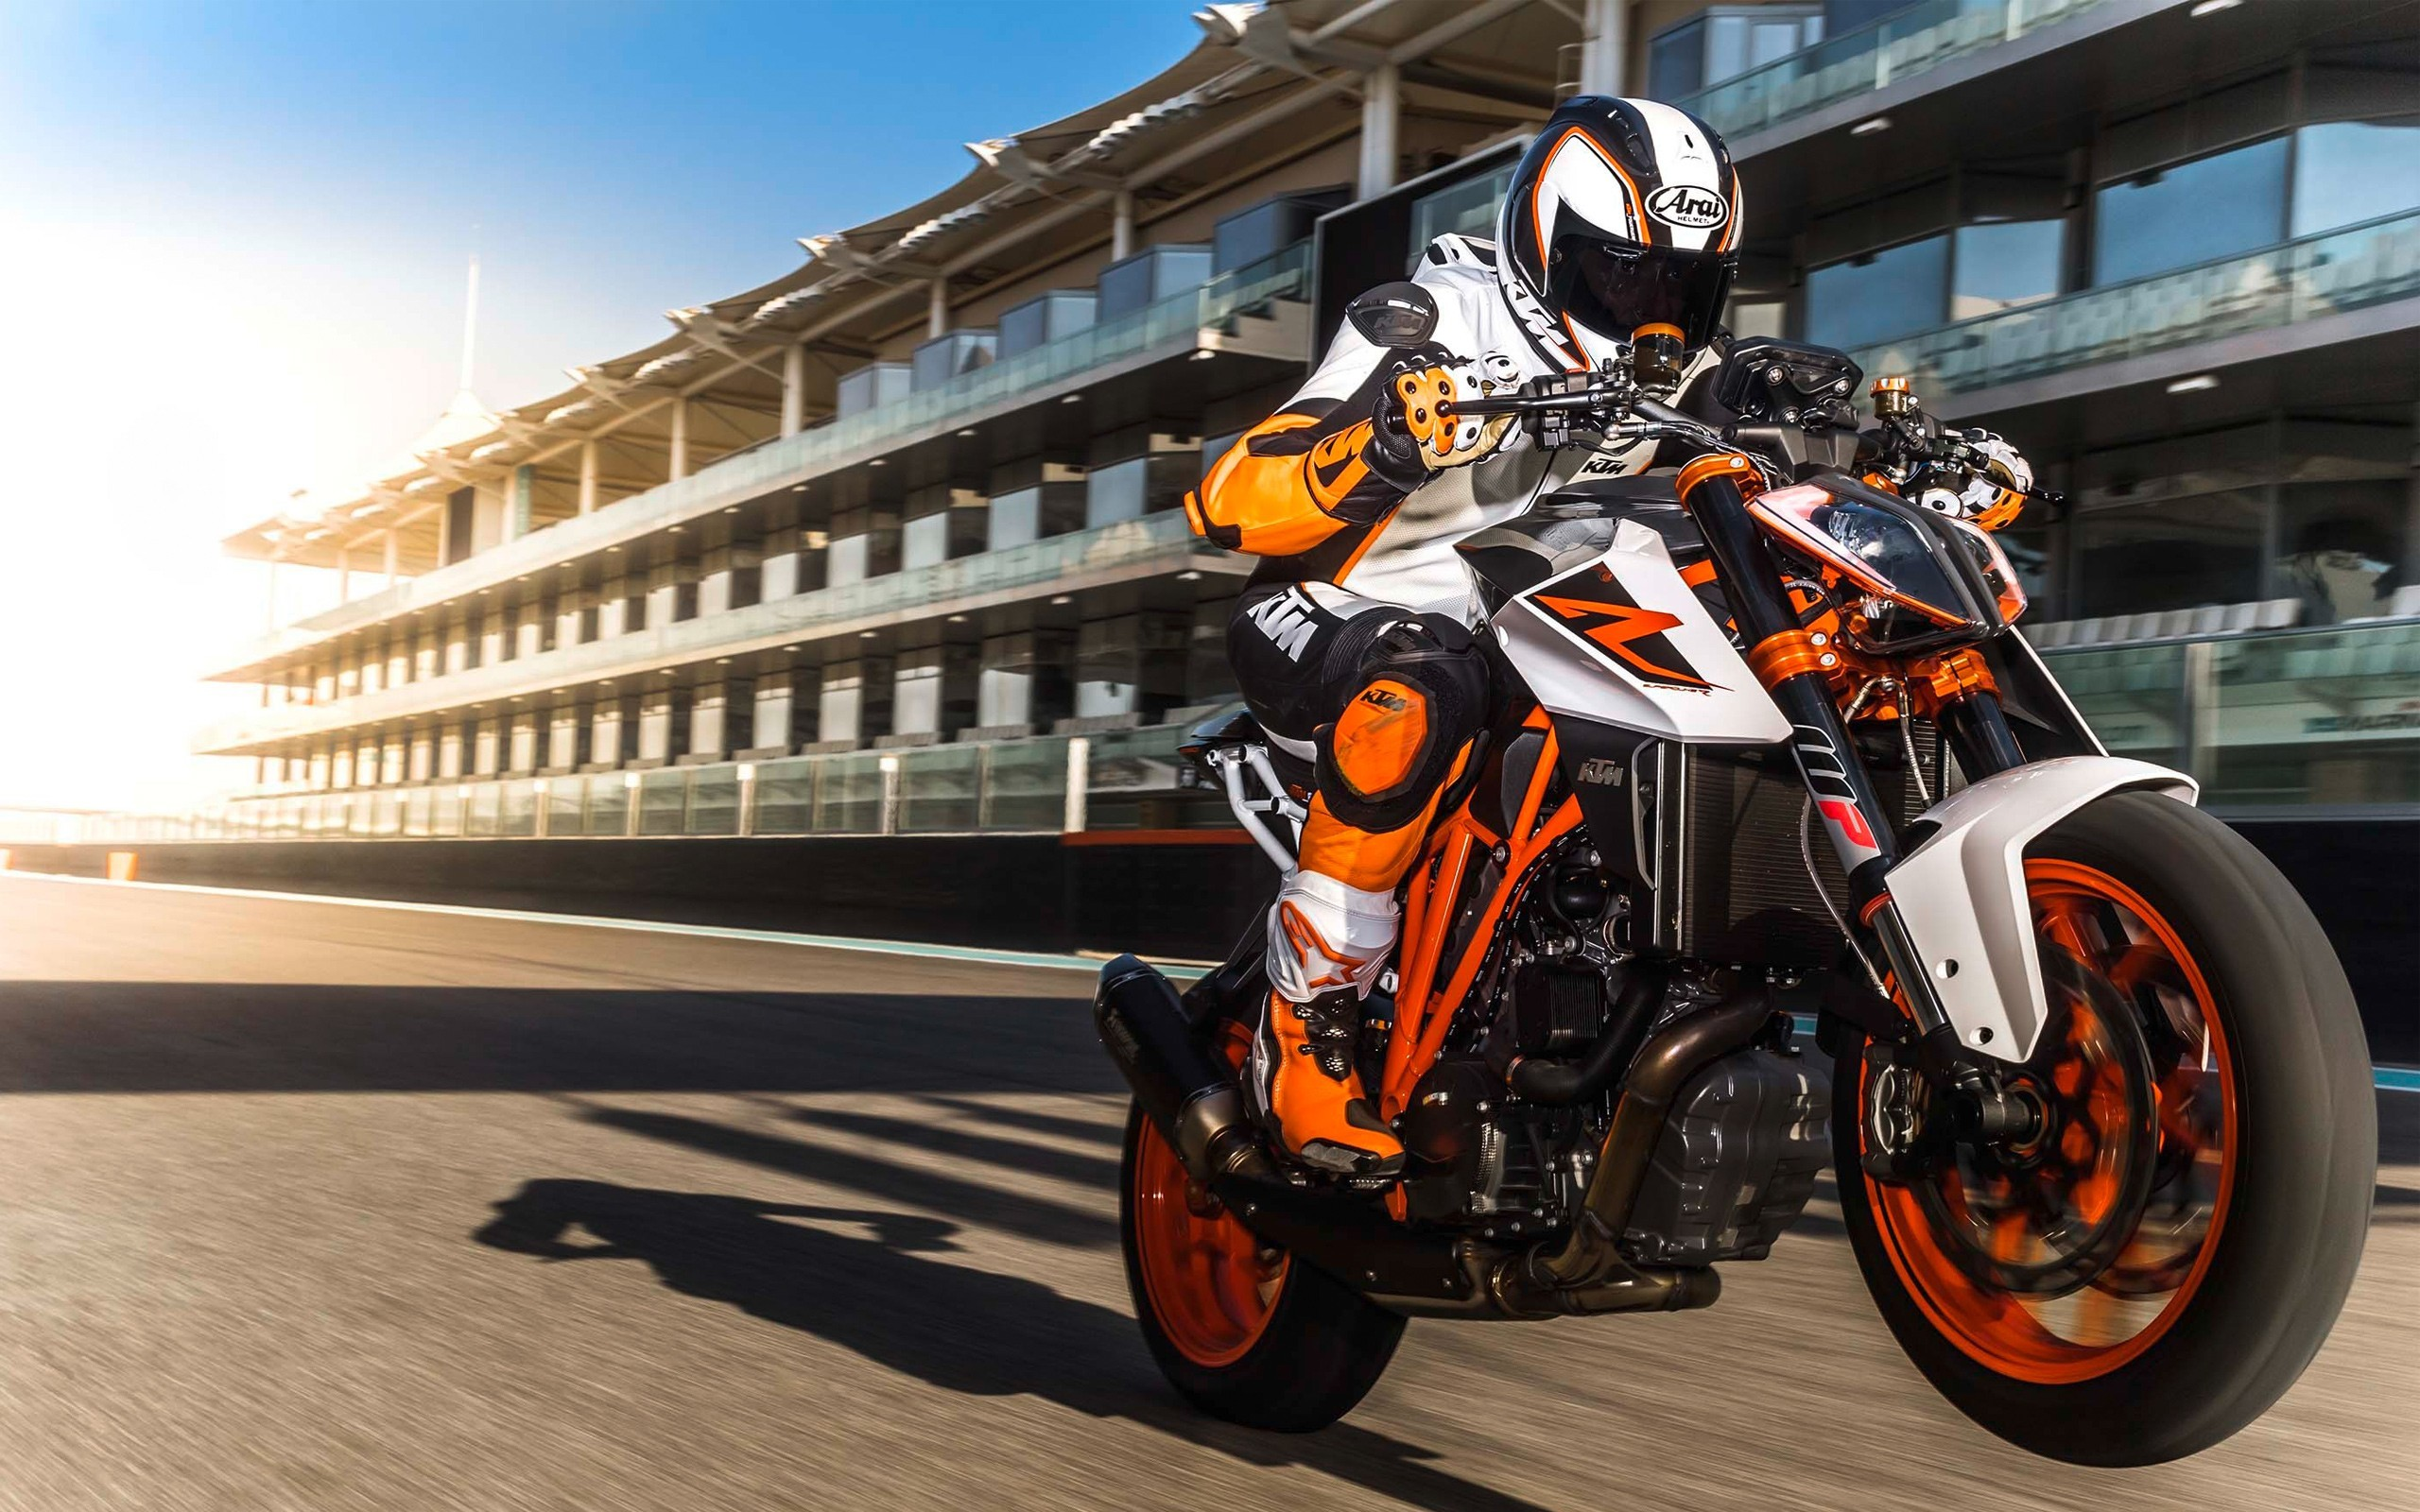 Res: 2560x1600, 2017 KTM 390 Duke 4K 8K